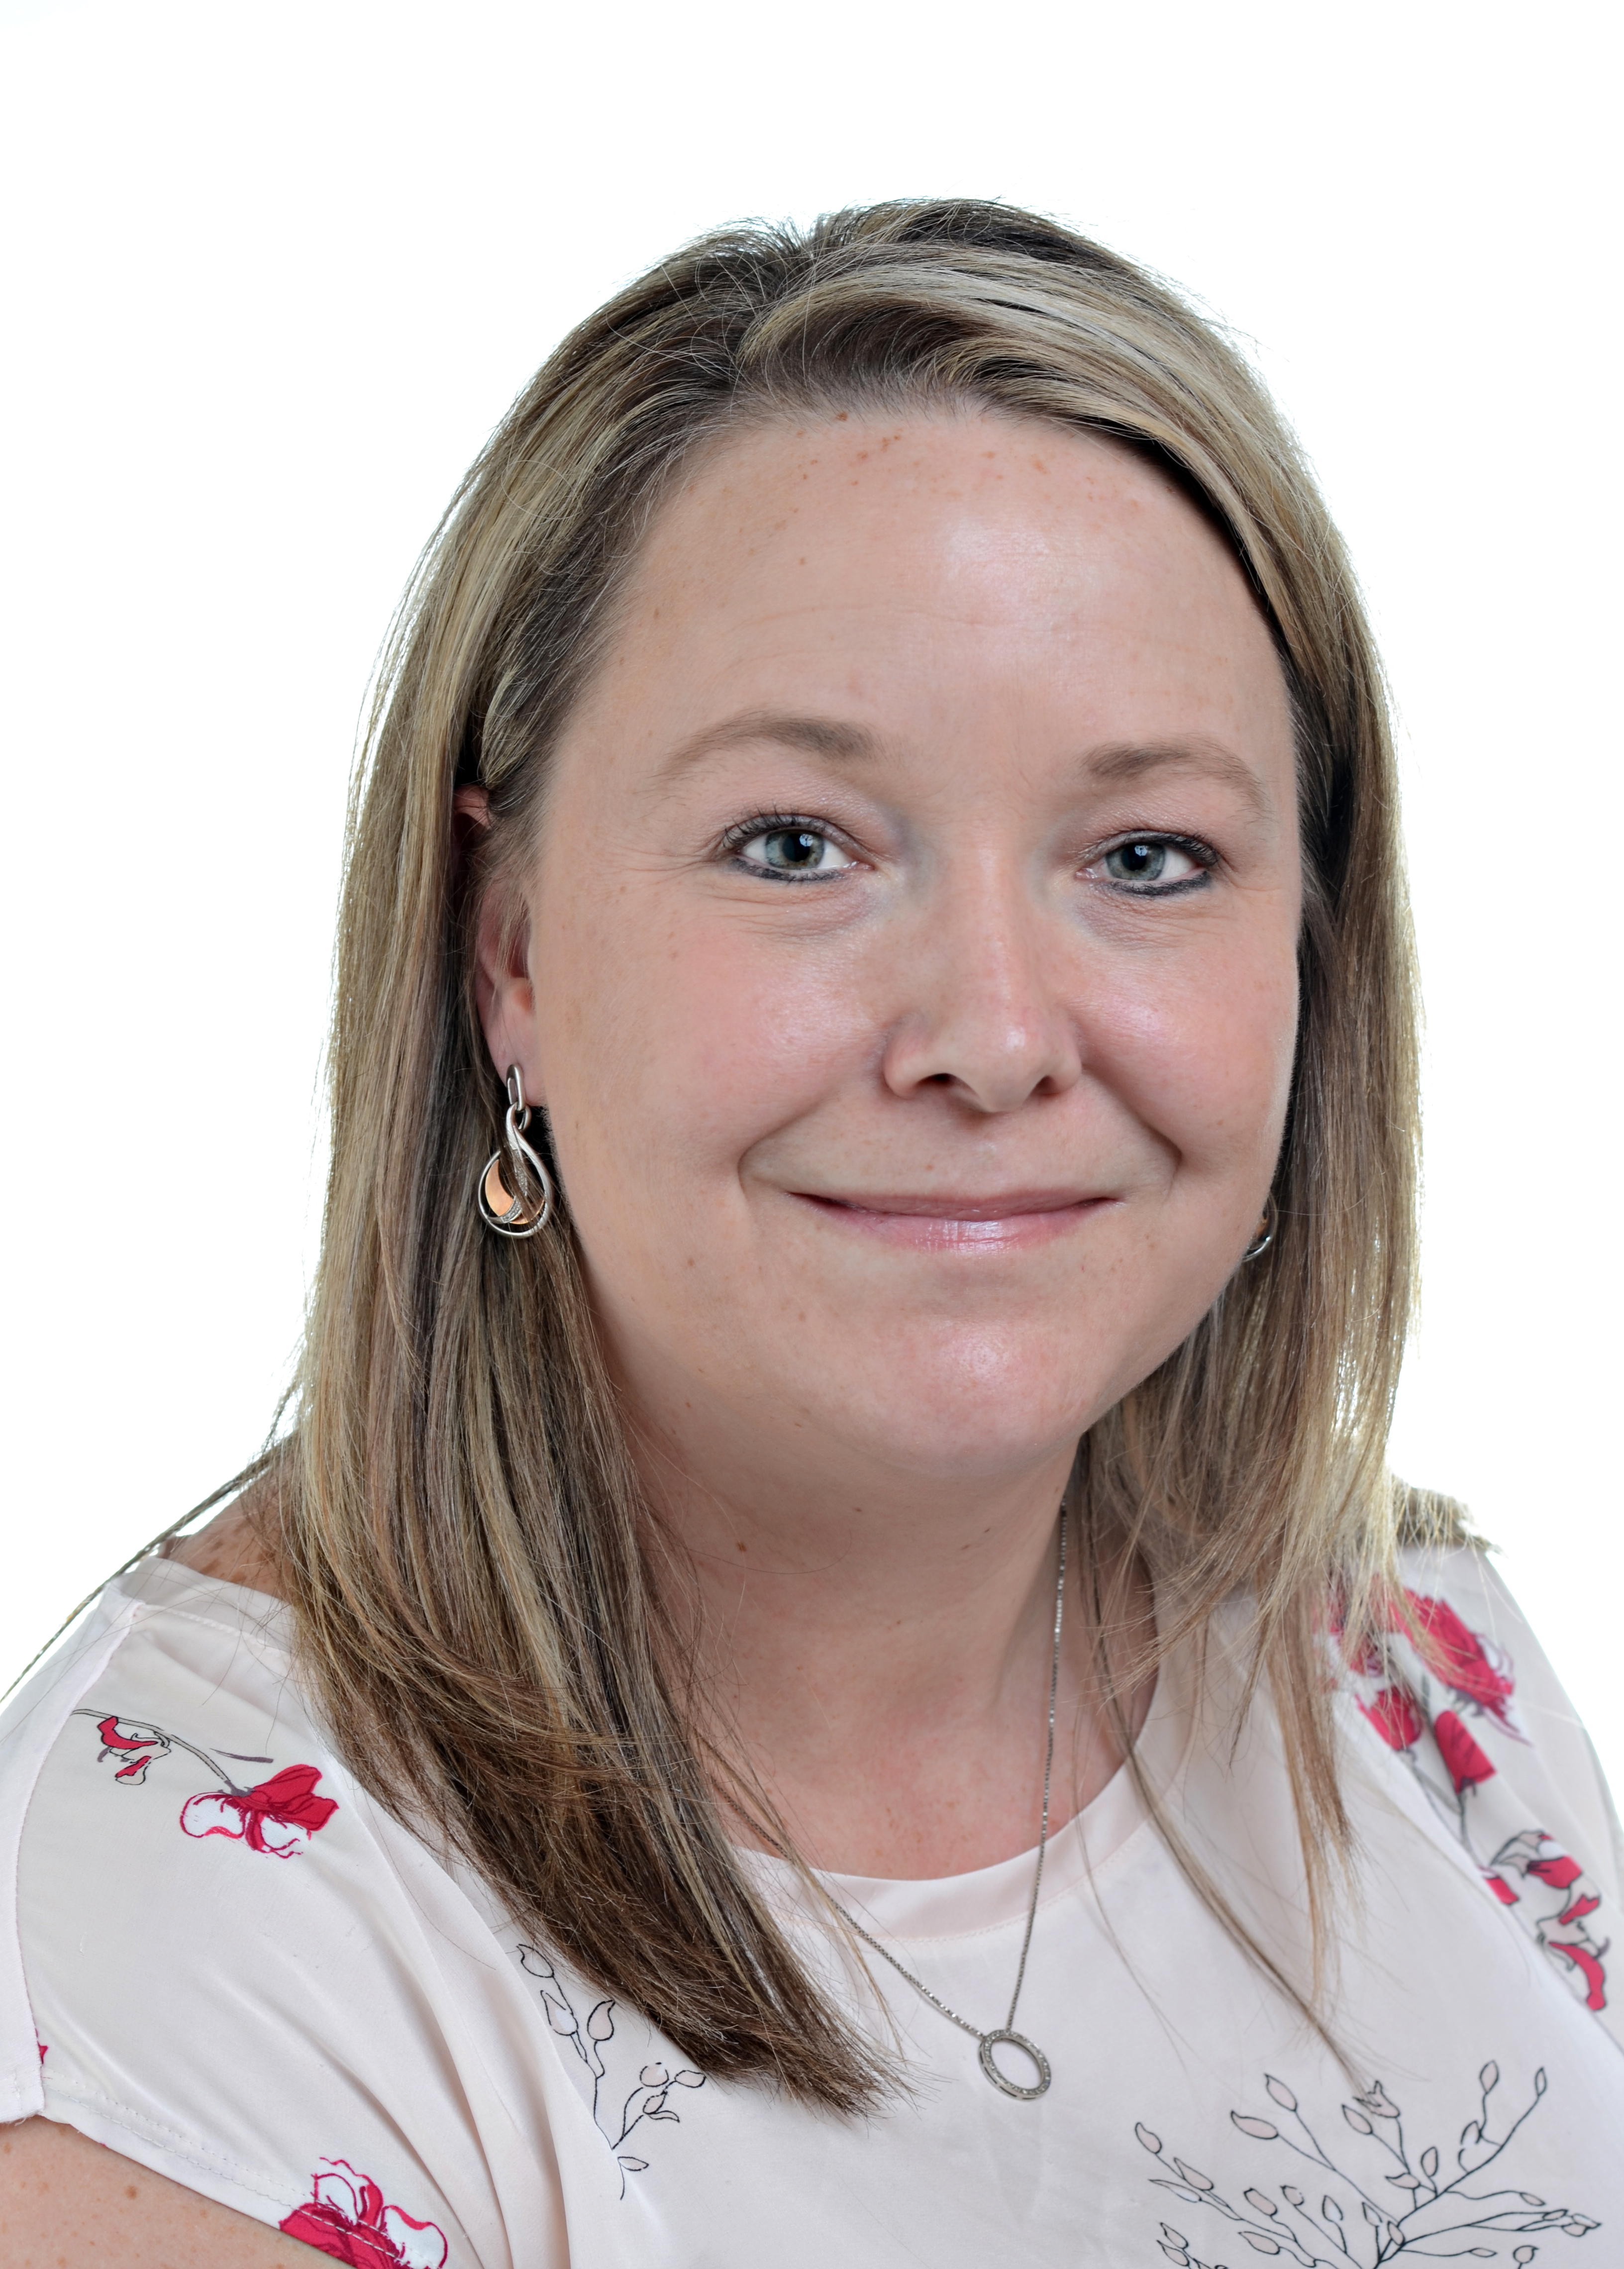 Melissa Roney